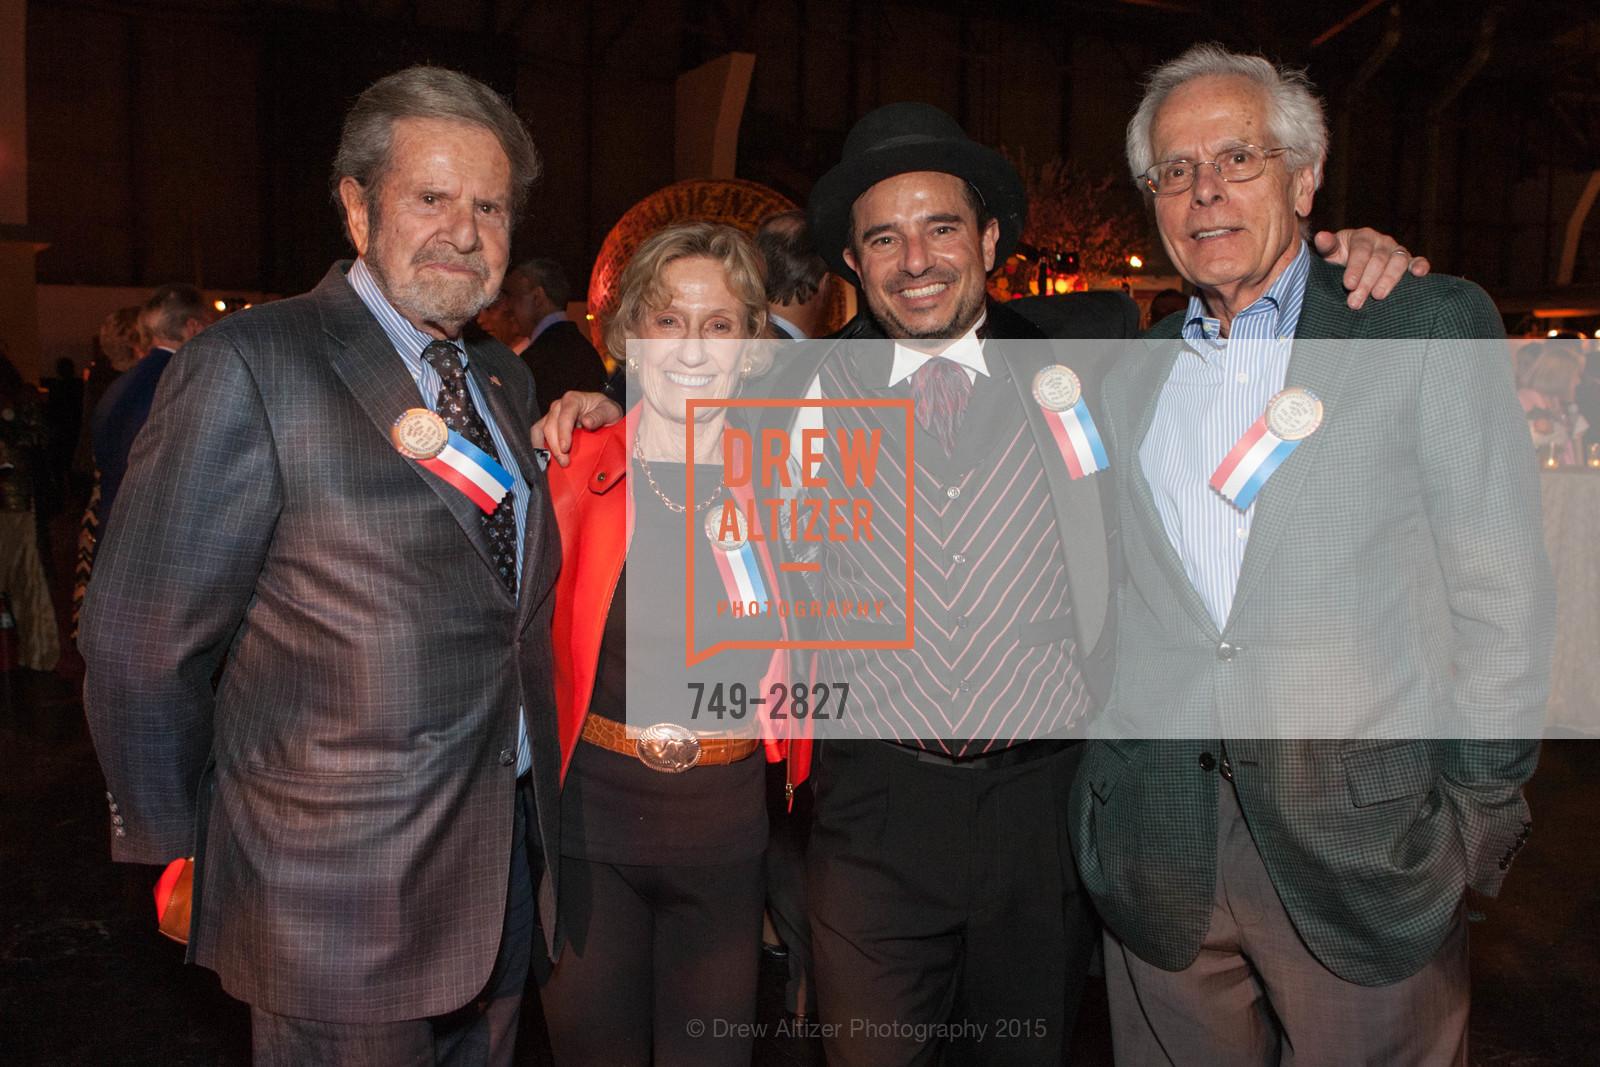 Tad Taube, Nancy Bechtle, Phil Ginsburg, Joachim Bechtle, Photo #749-2827